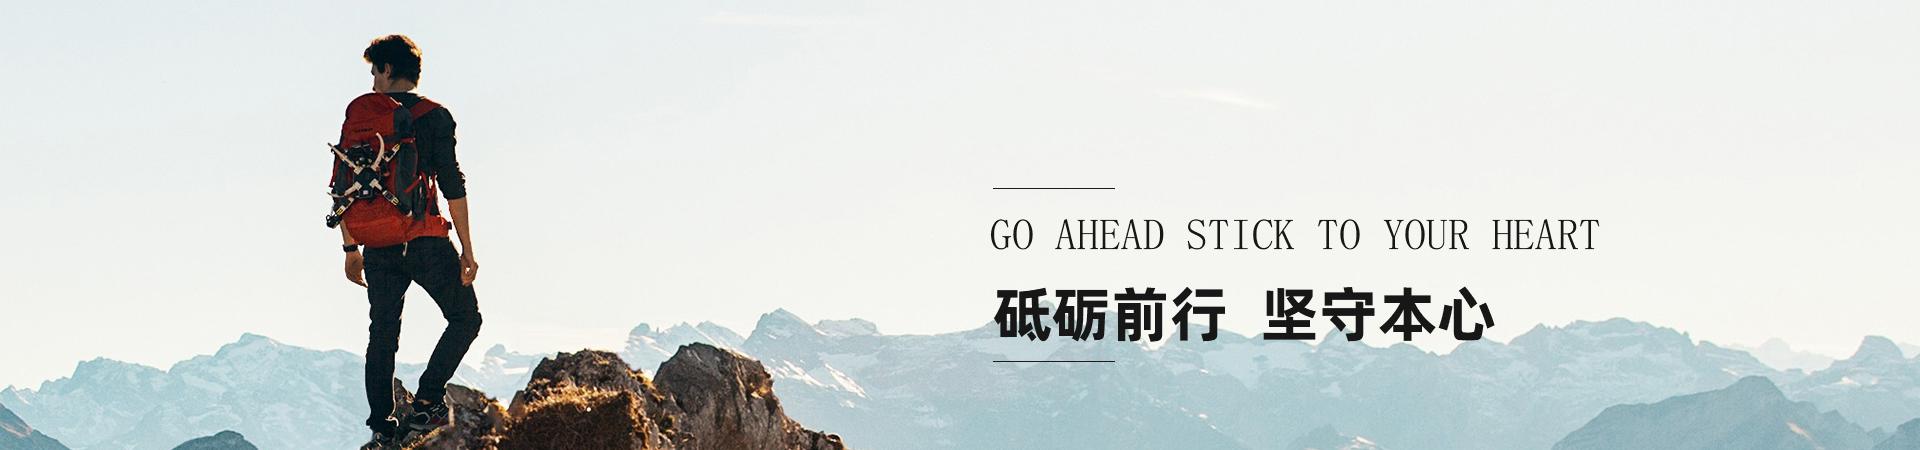 http://www.wangyuanfood.com/data/upload/201911/20191121141318_549.jpg